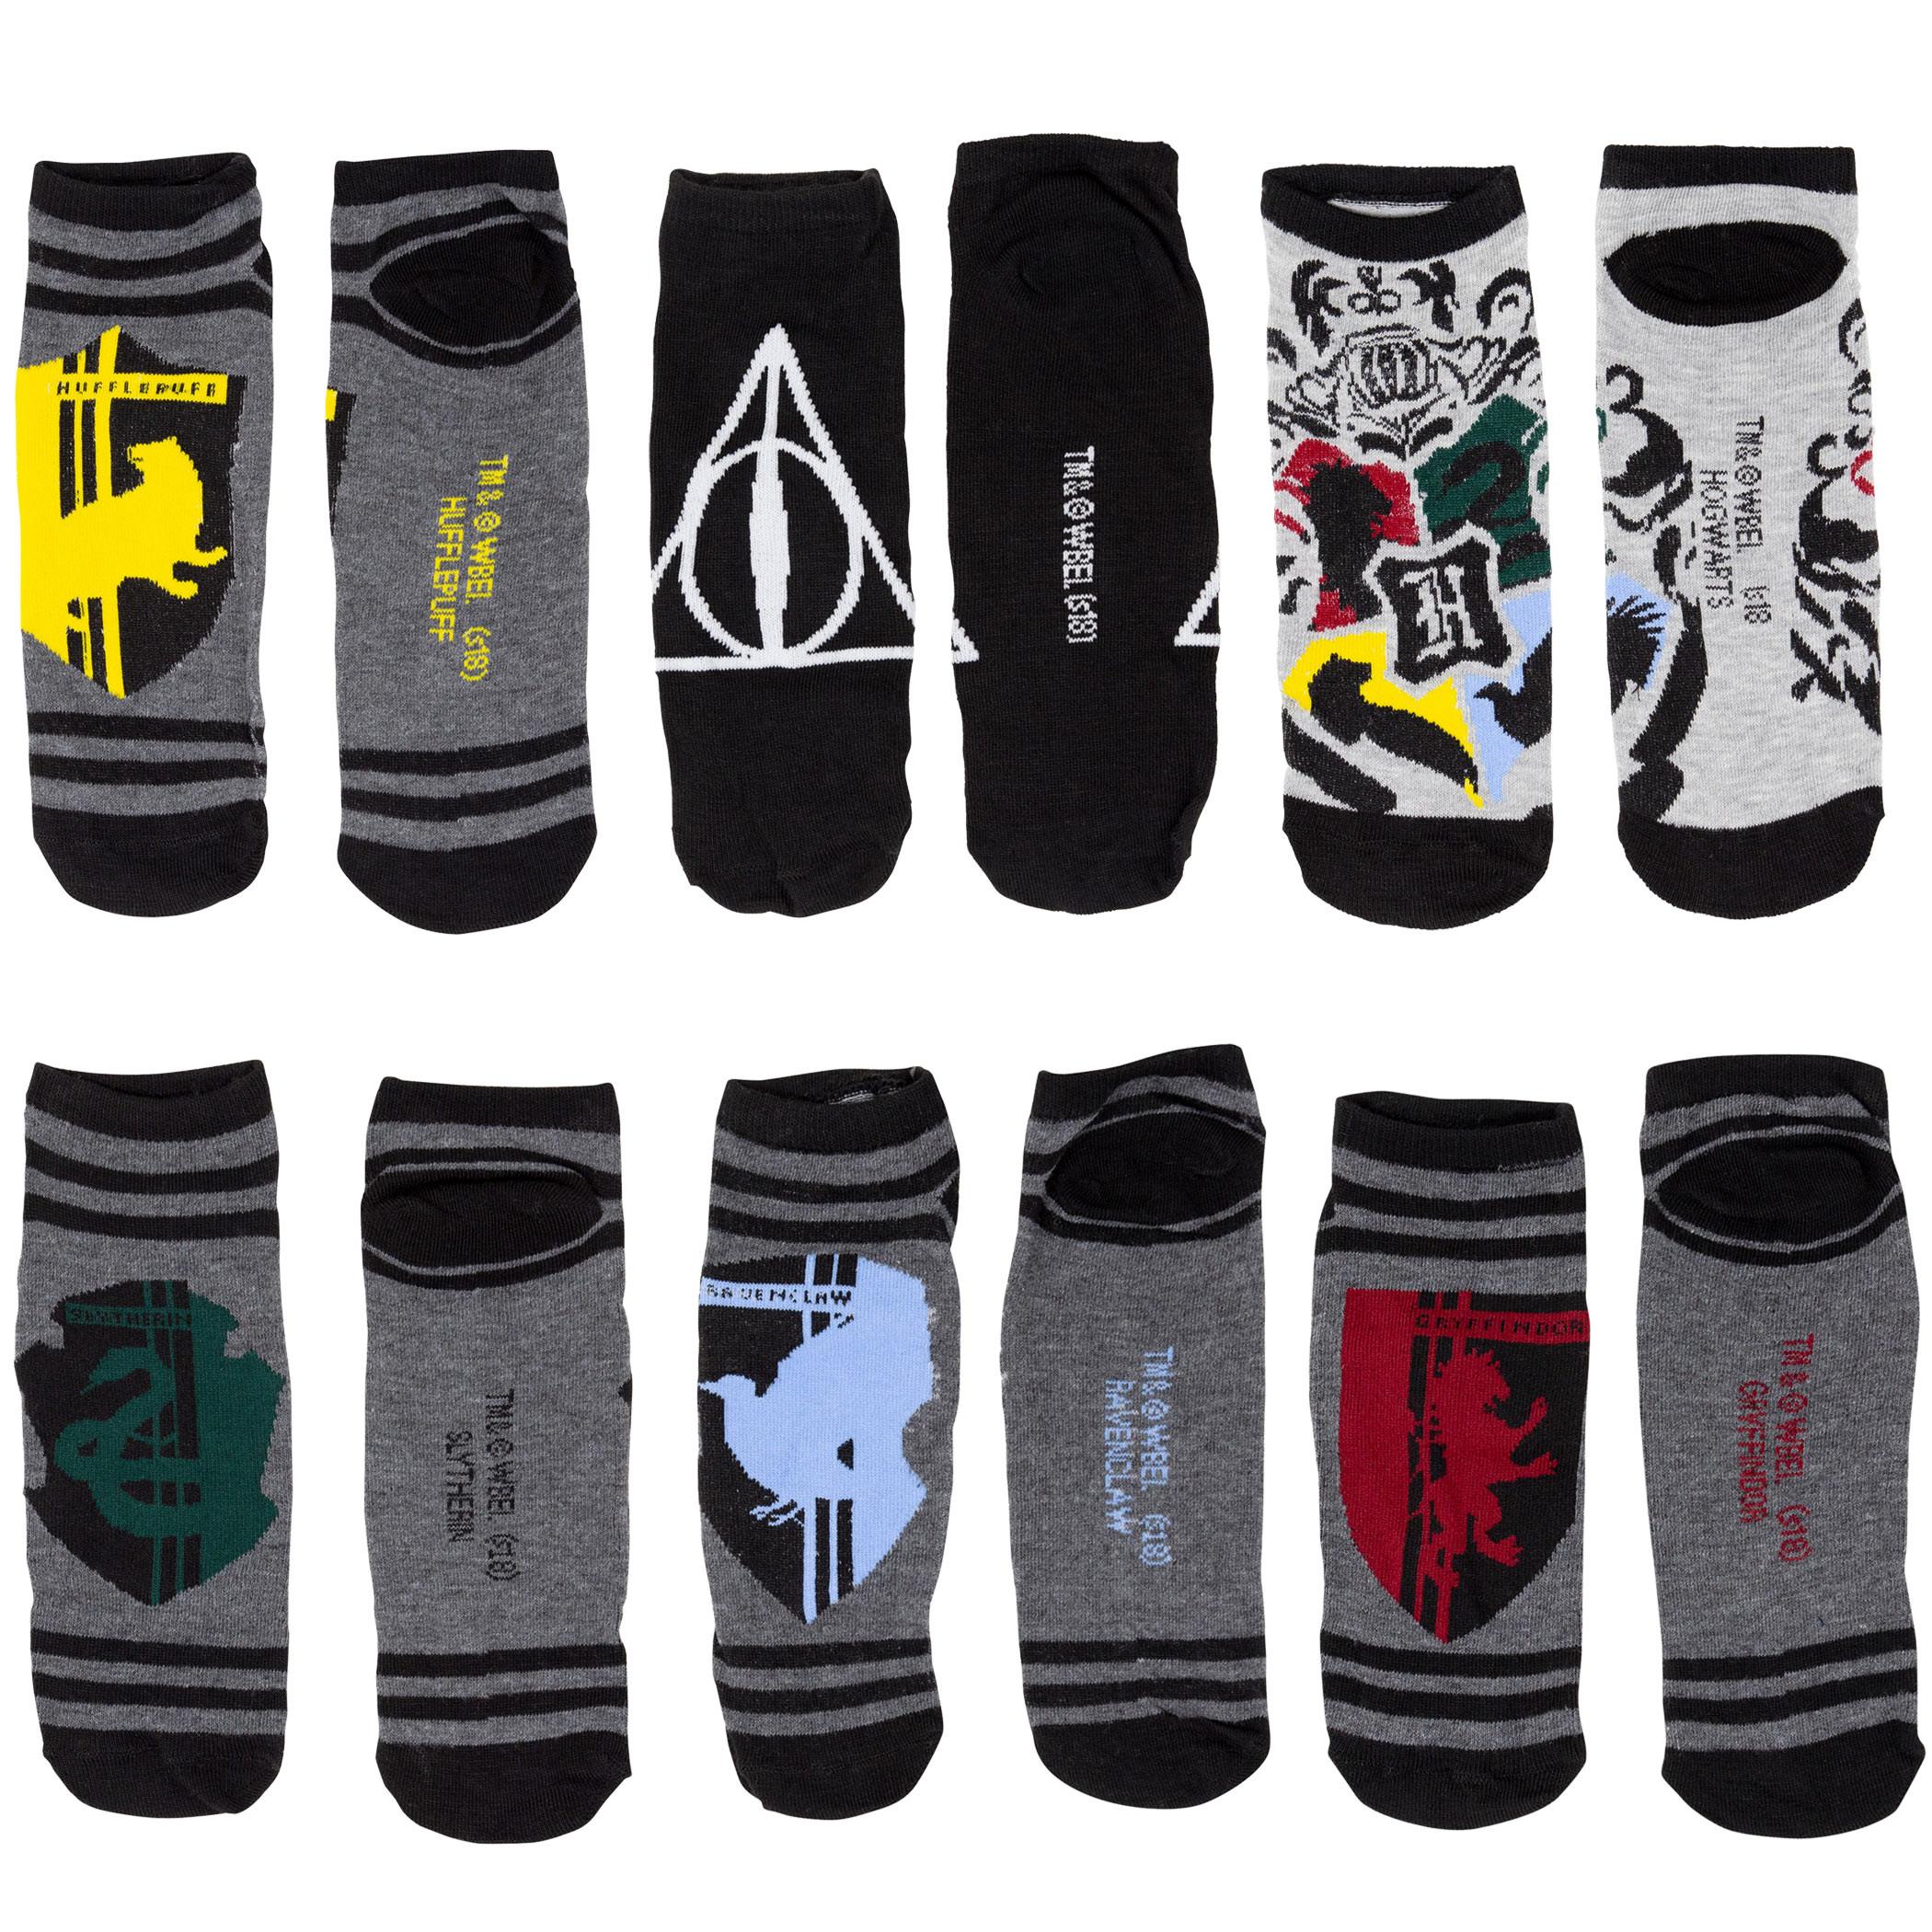 Harry Potter 12 Pairs Socks Gift Giving Box